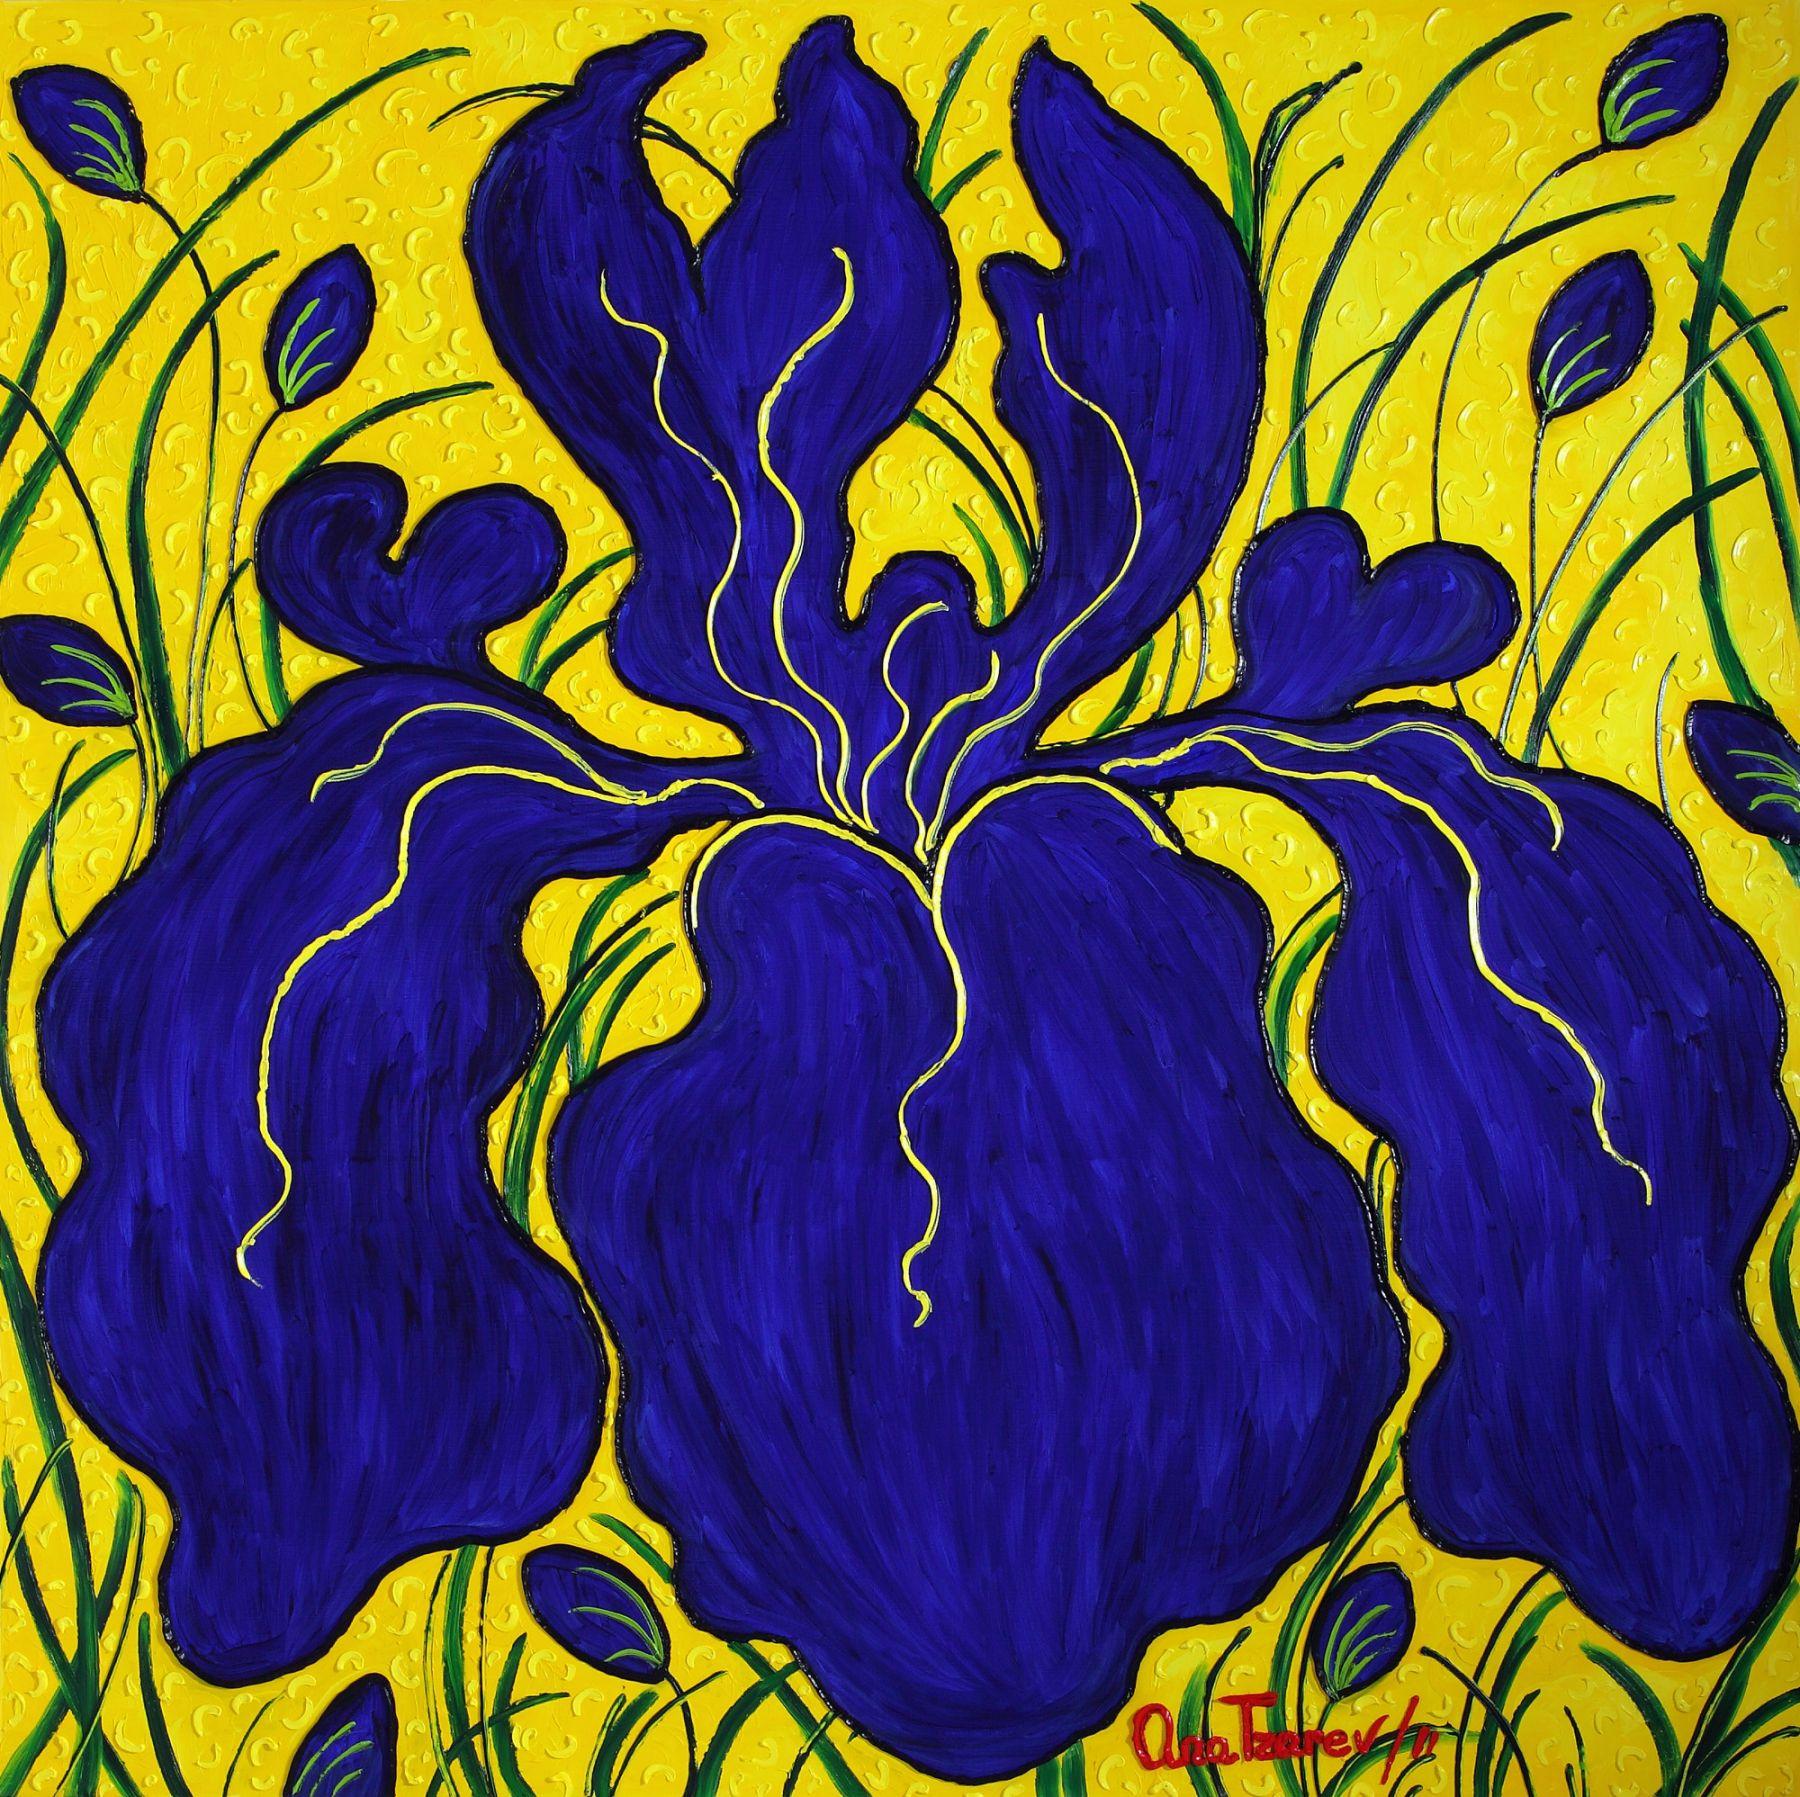 Emperator (Iris) (Garden La Fleur du Cap), 2011 n 4169